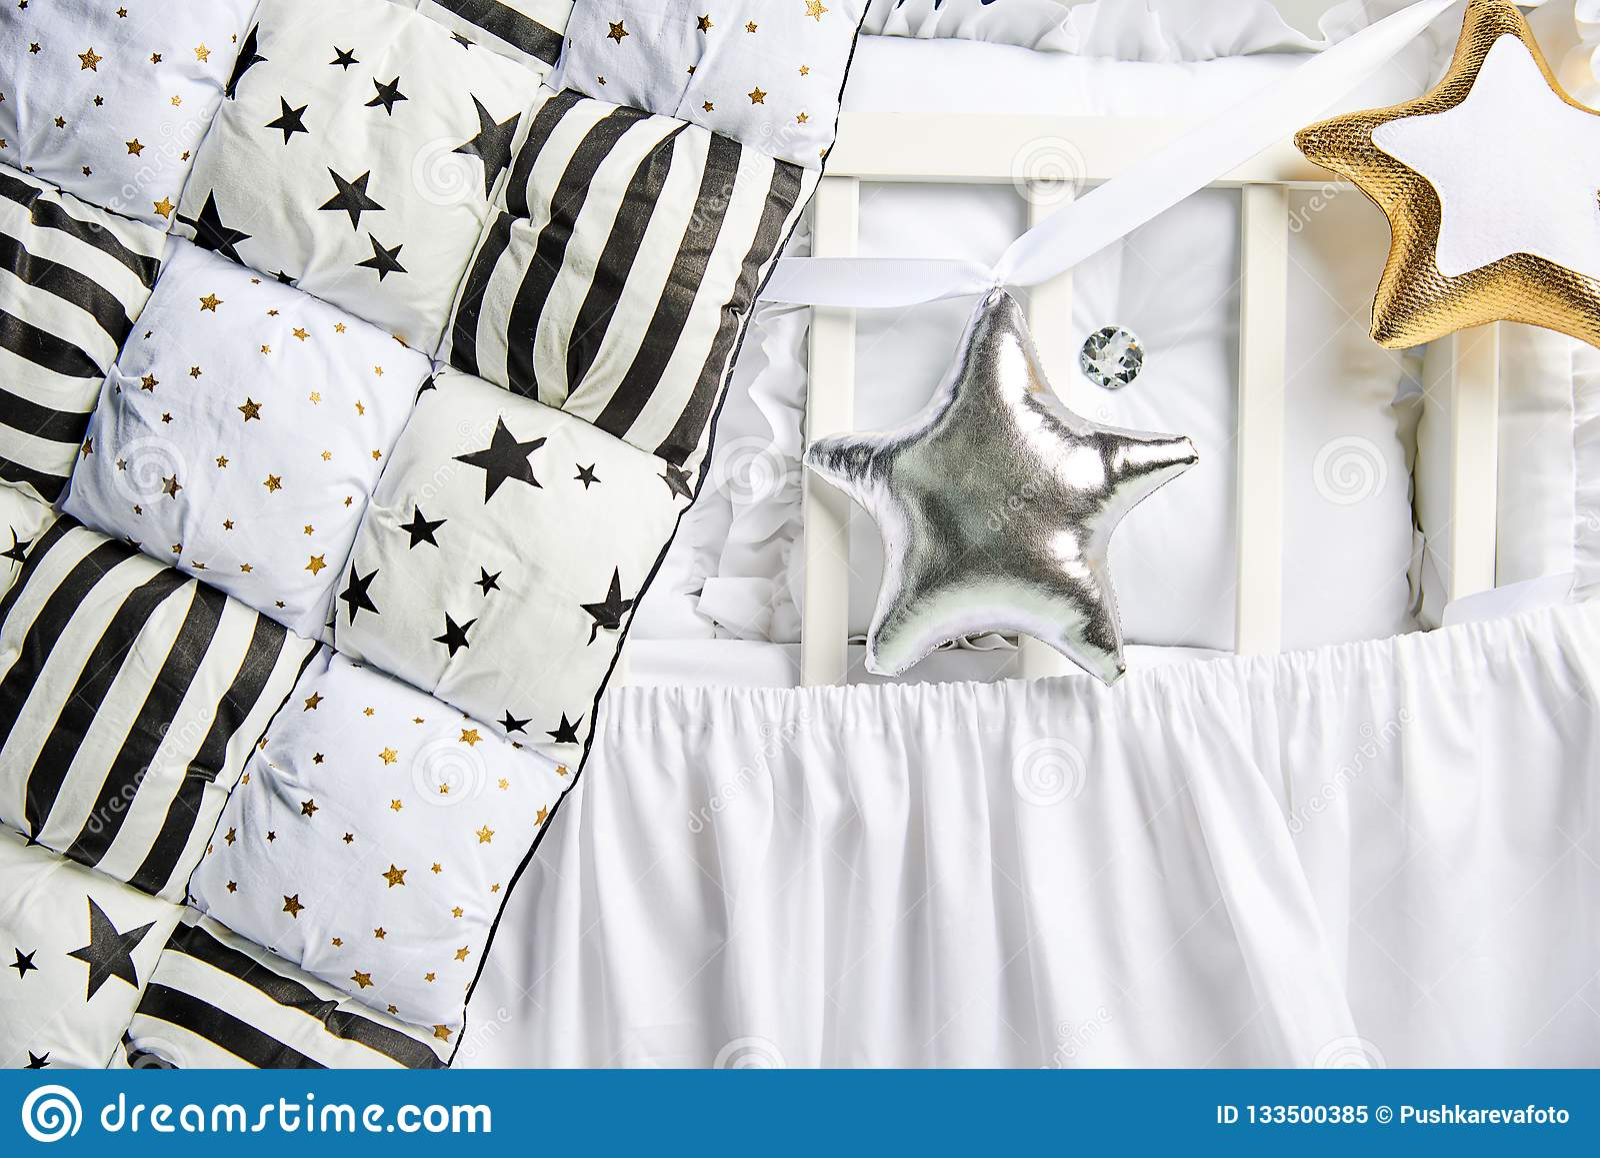 Звезда серебра и золота сформировала подушки и одеяло заплатки на белой кроватке младенца